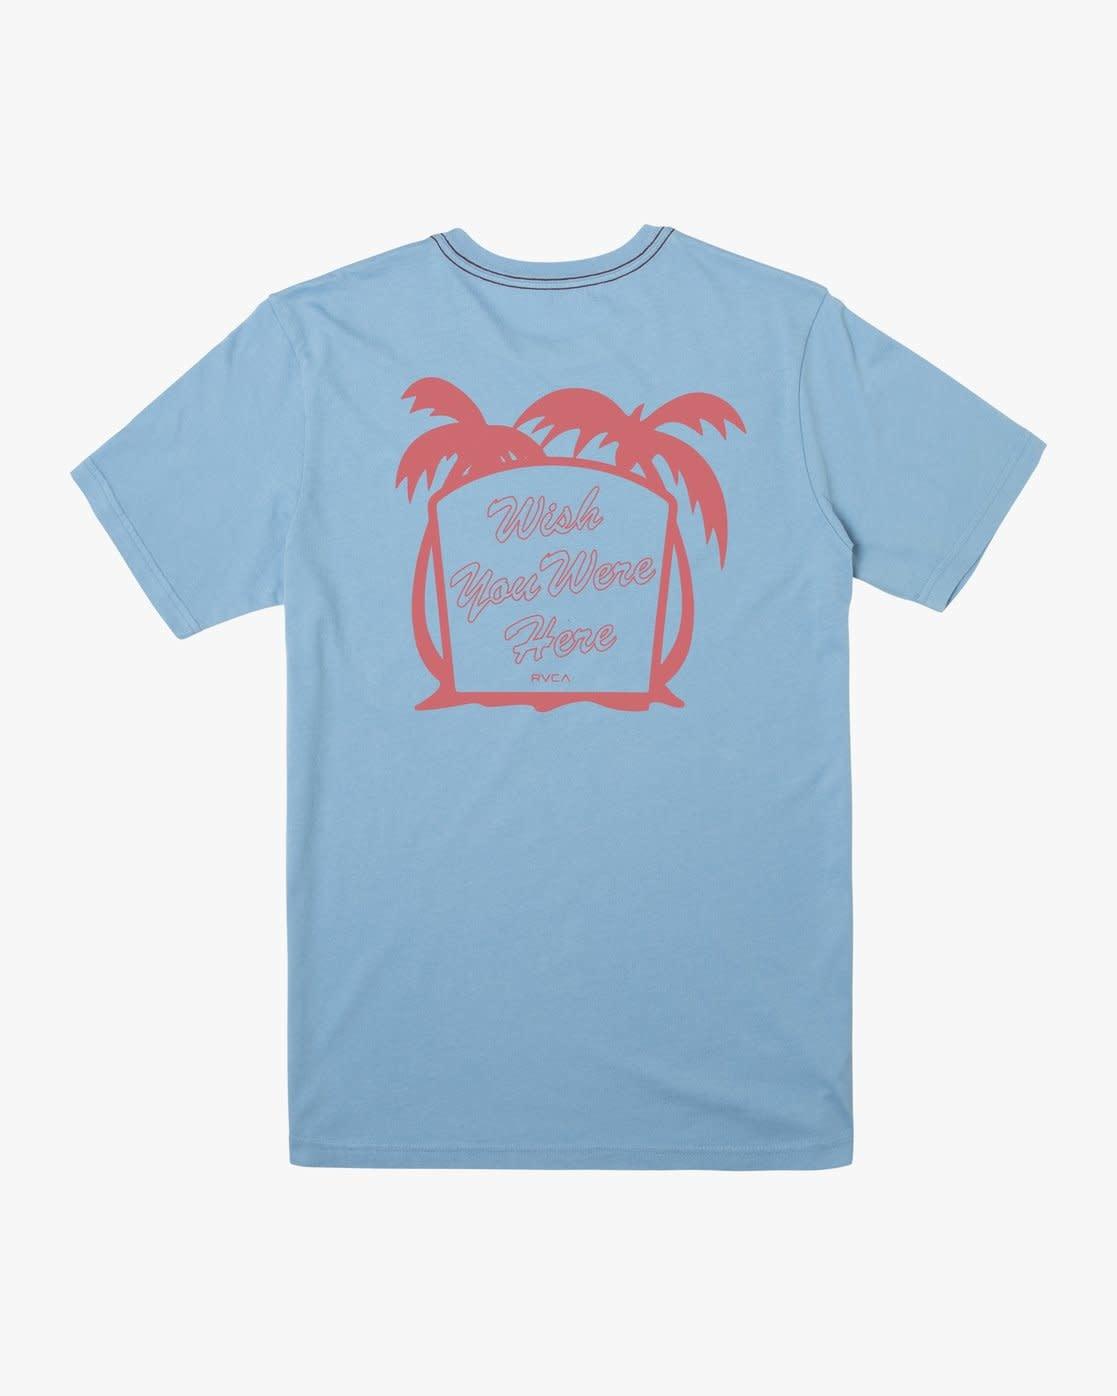 RVCA Were Here T-shirt-1